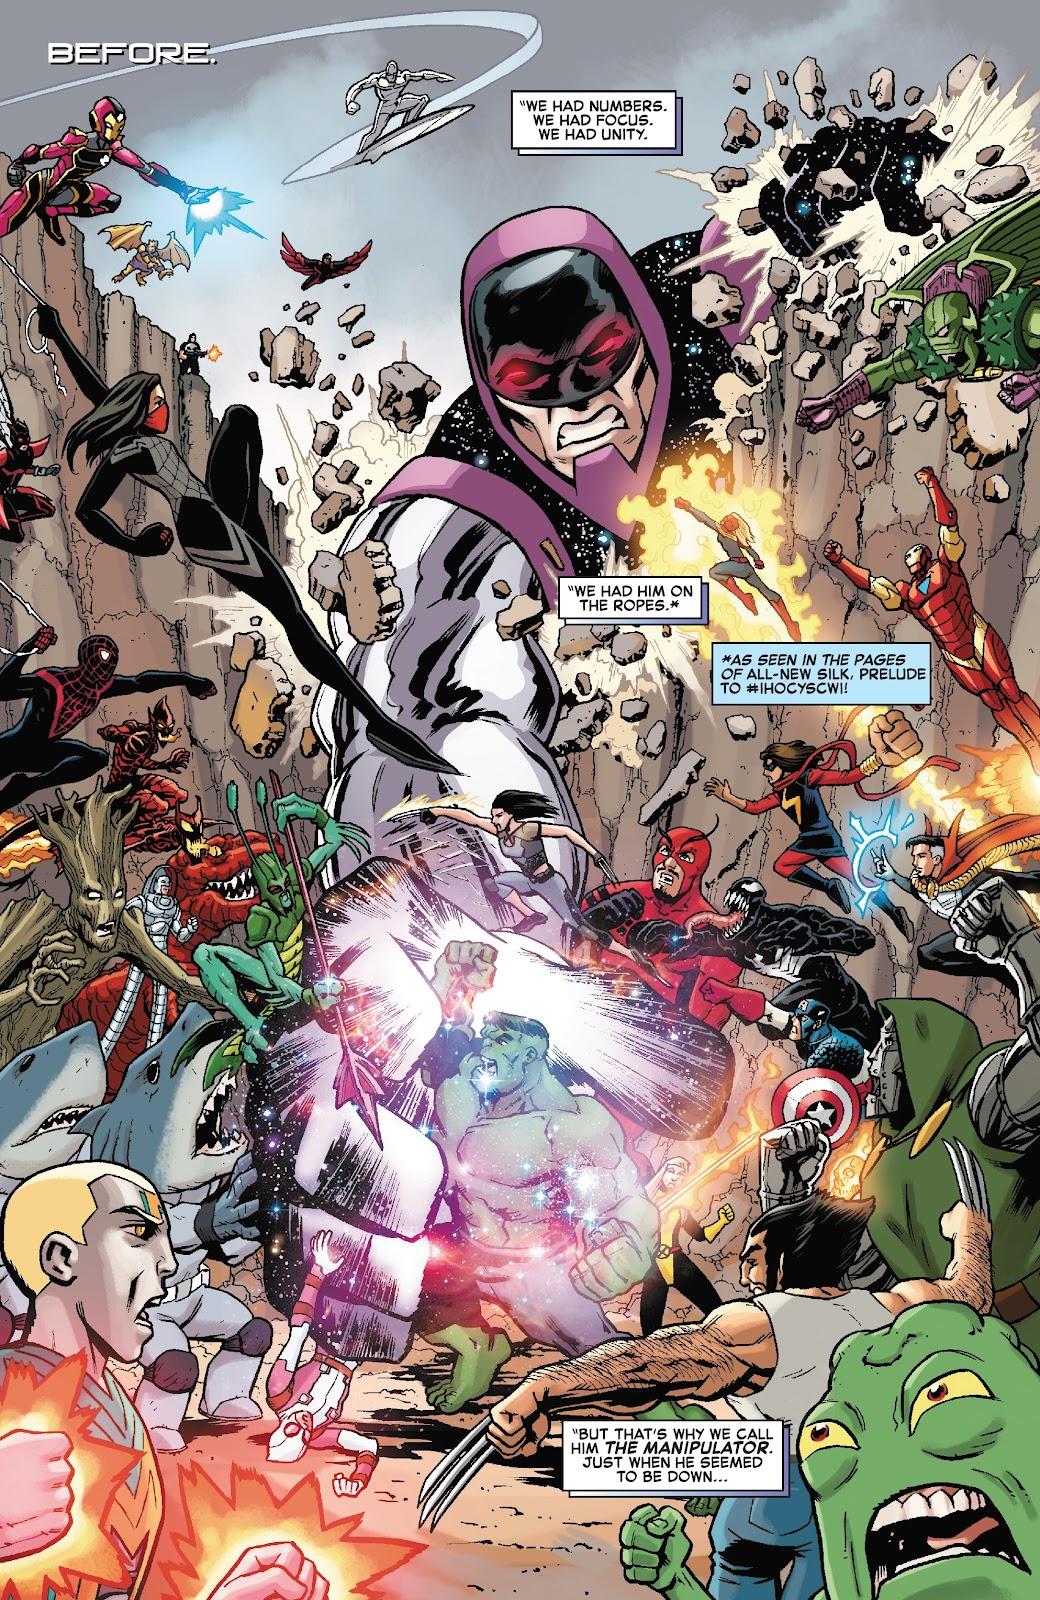 Read online Spider-Man/Deadpool comic -  Issue #47 - 3